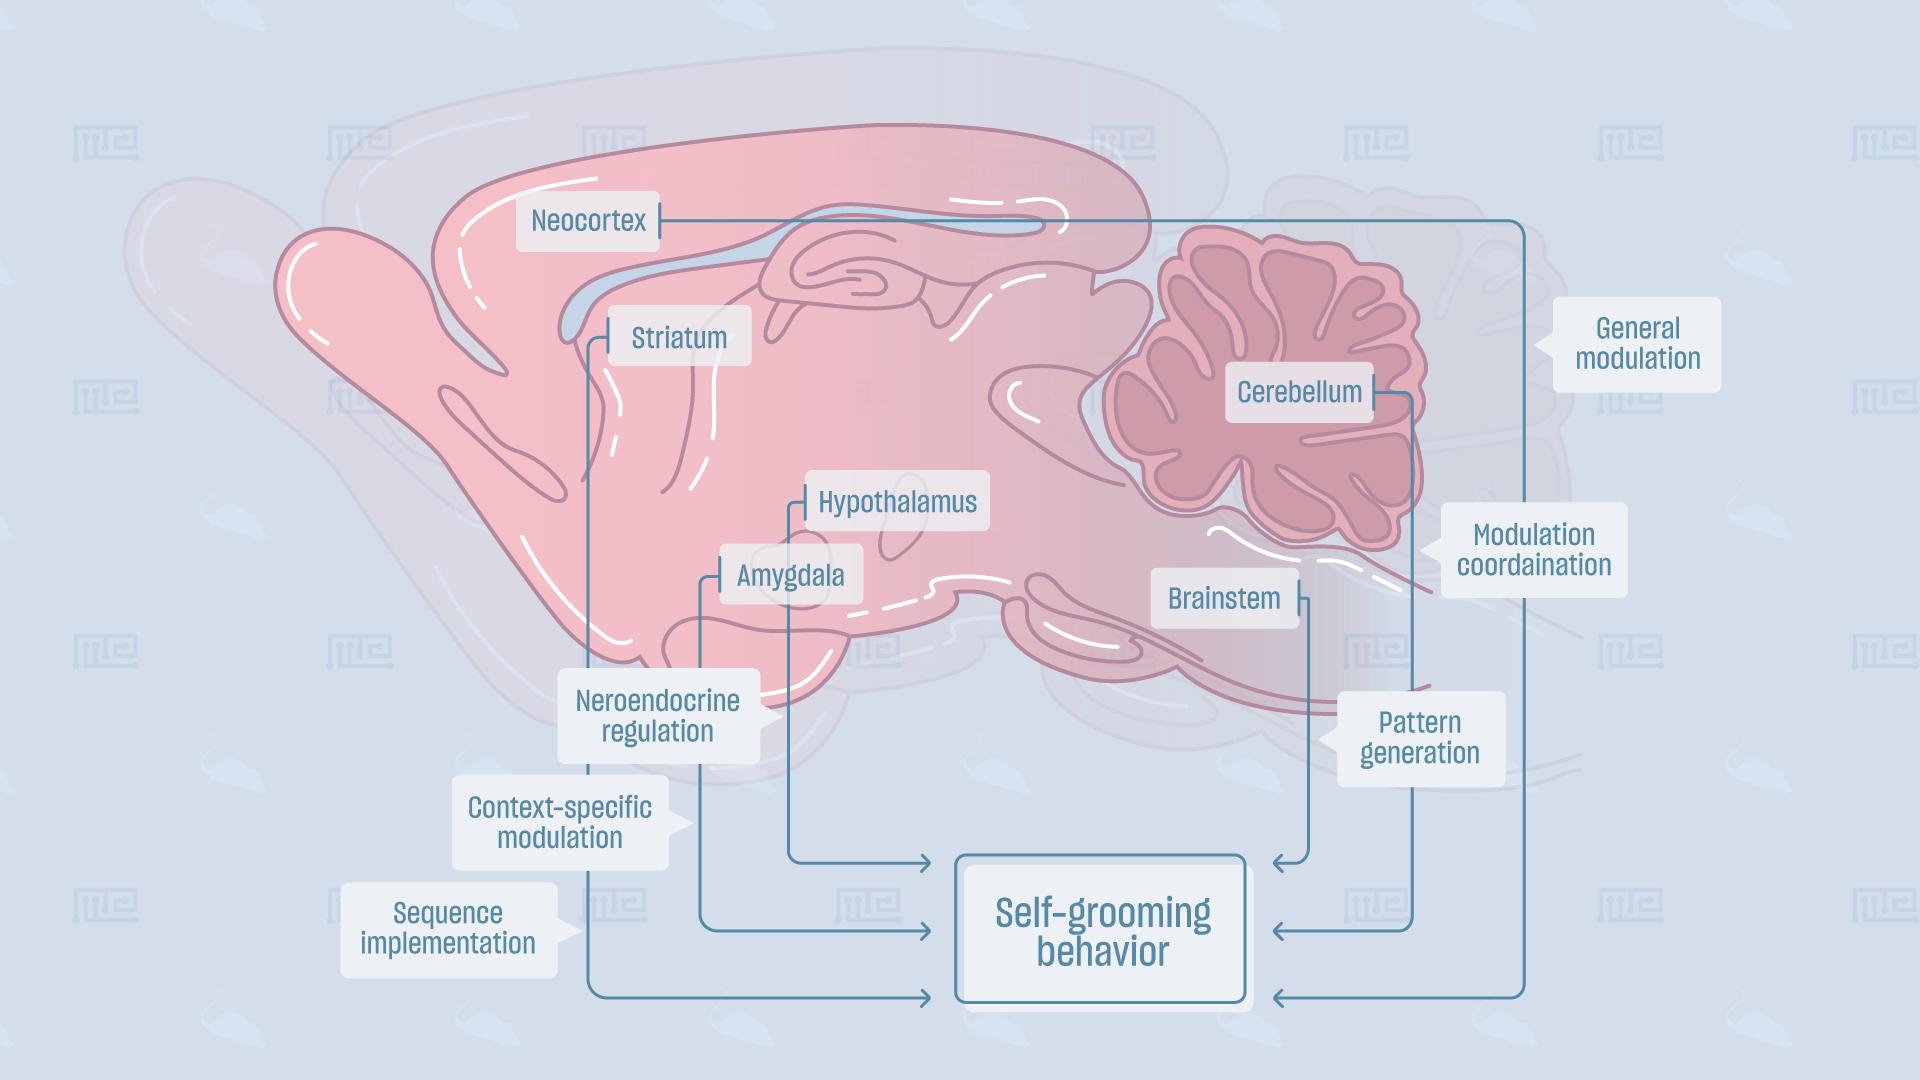 Self-Grooming-Behavior brain correlates